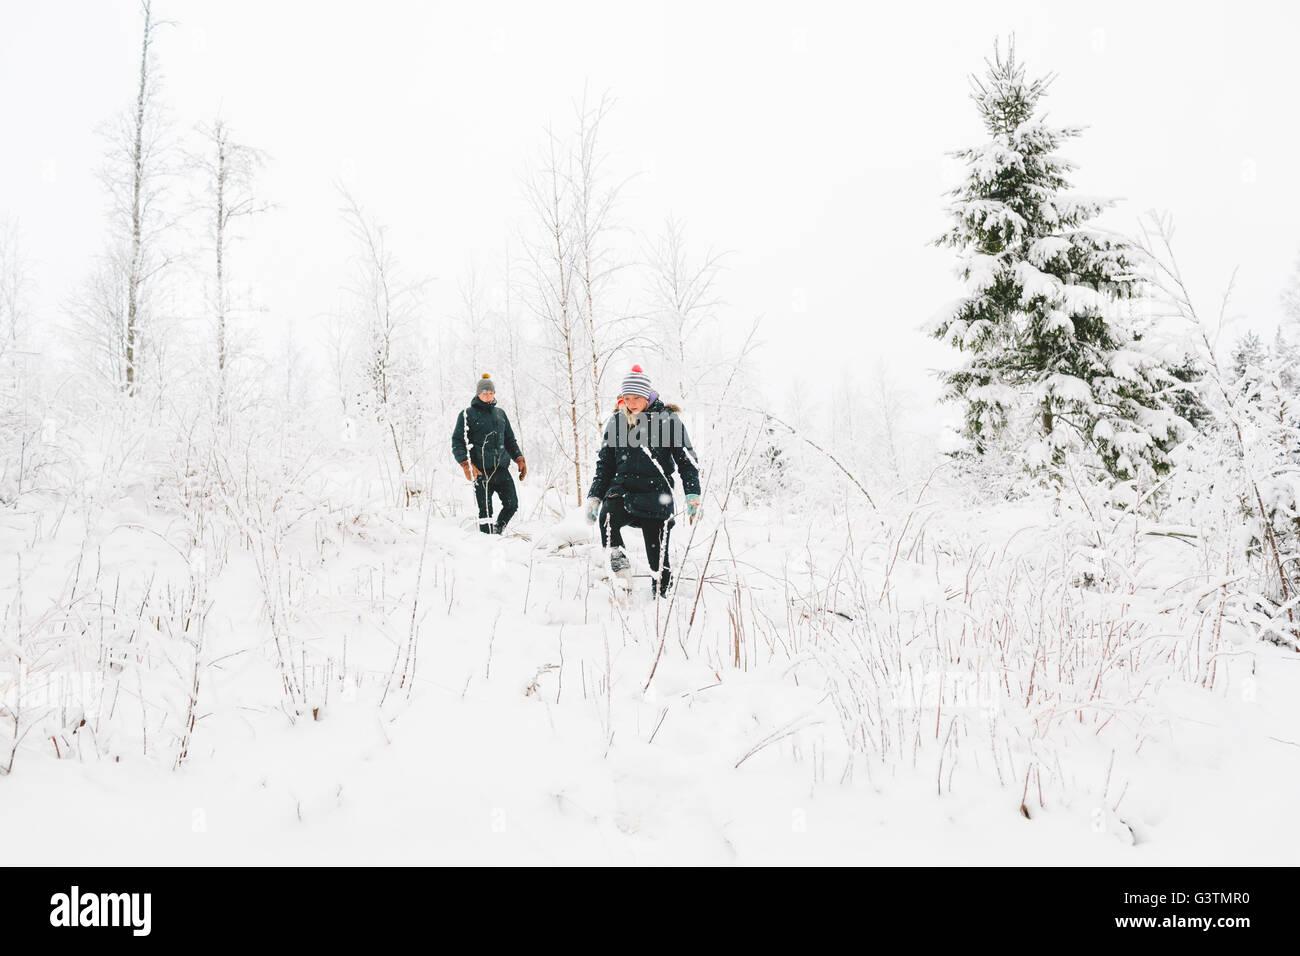 La Finlande, Jyvaskyla, Saakoski, jeune couple en train de marcher parmi les arbres nus en hiver Photo Stock